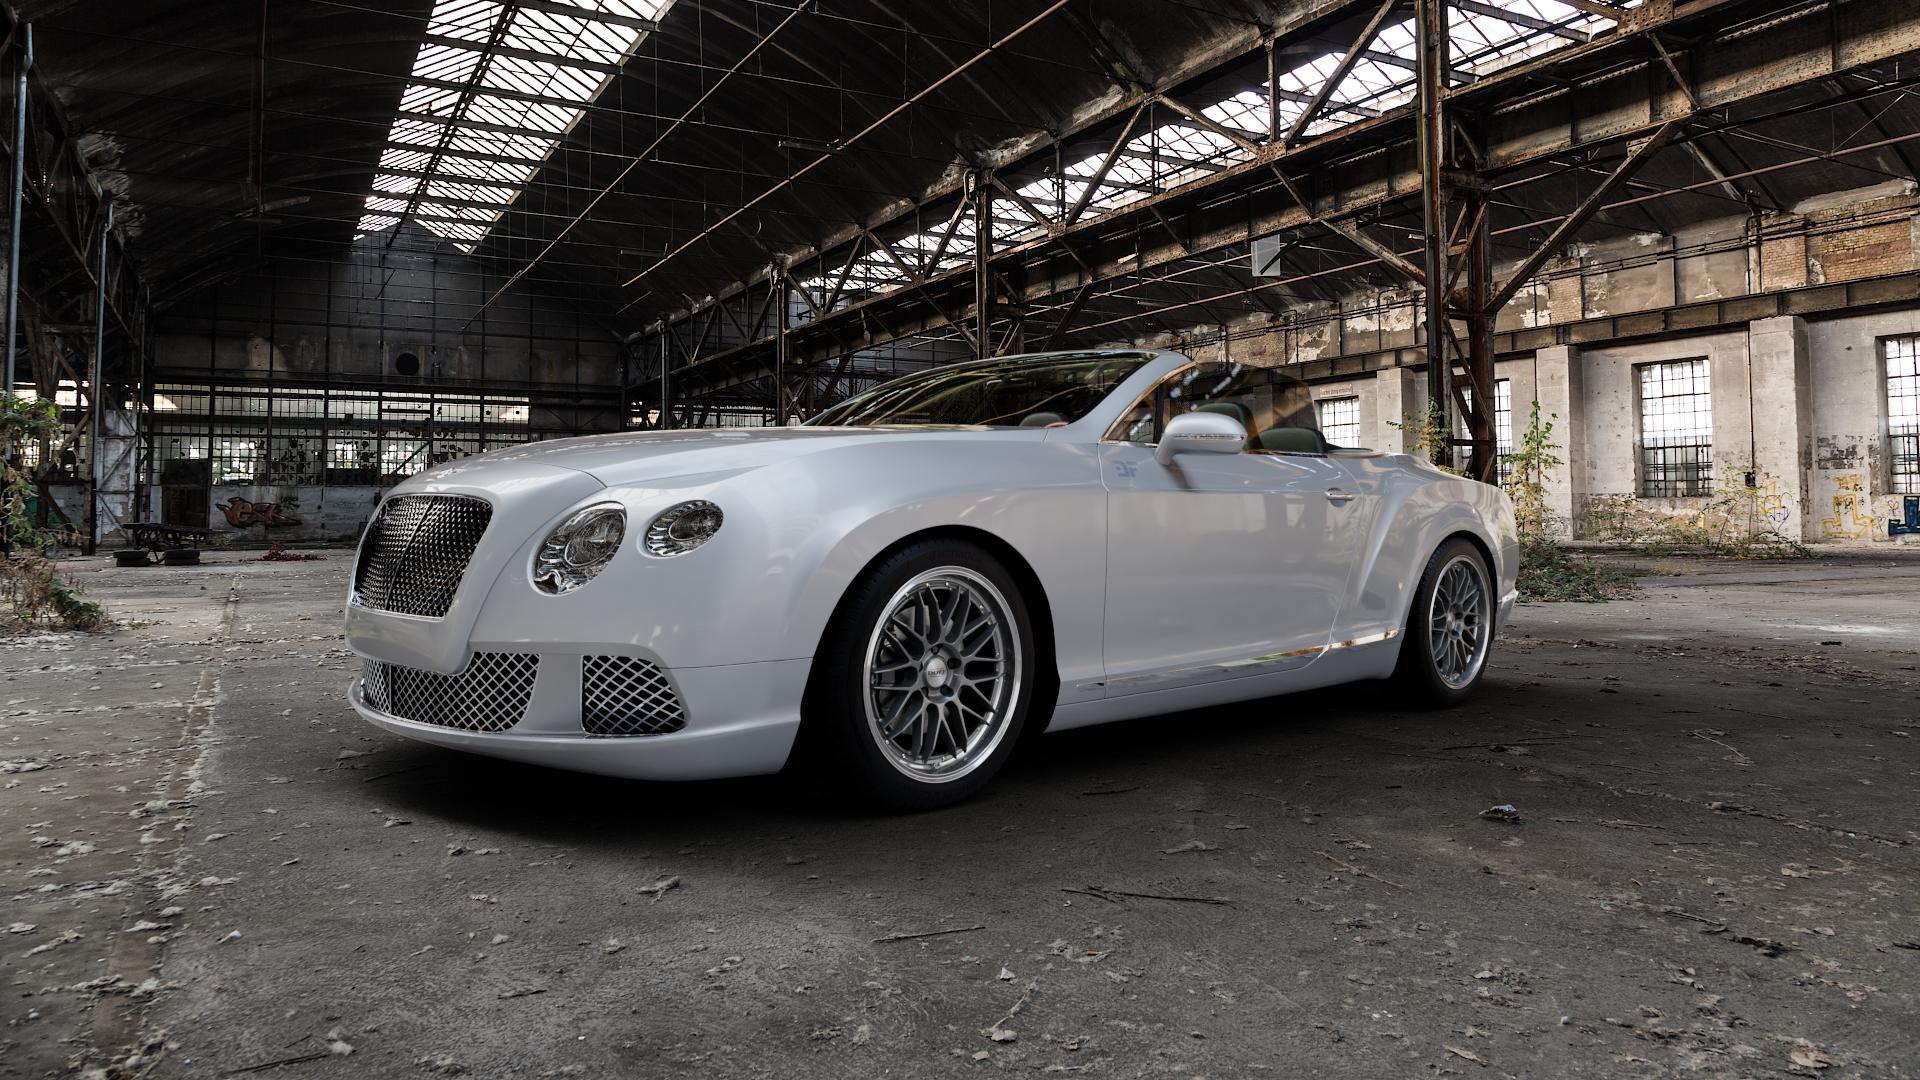 DOTZ REVVO GUNMETAL POLISHED Felge mit Reifen grau silber mehrfarbig in 19Zoll Alufelge auf silbernem Bentley Continental Flying Spur GT GTC ⬇️ mit 15mm Tieferlegung ⬇️ Industriehalle 1 Camera_000